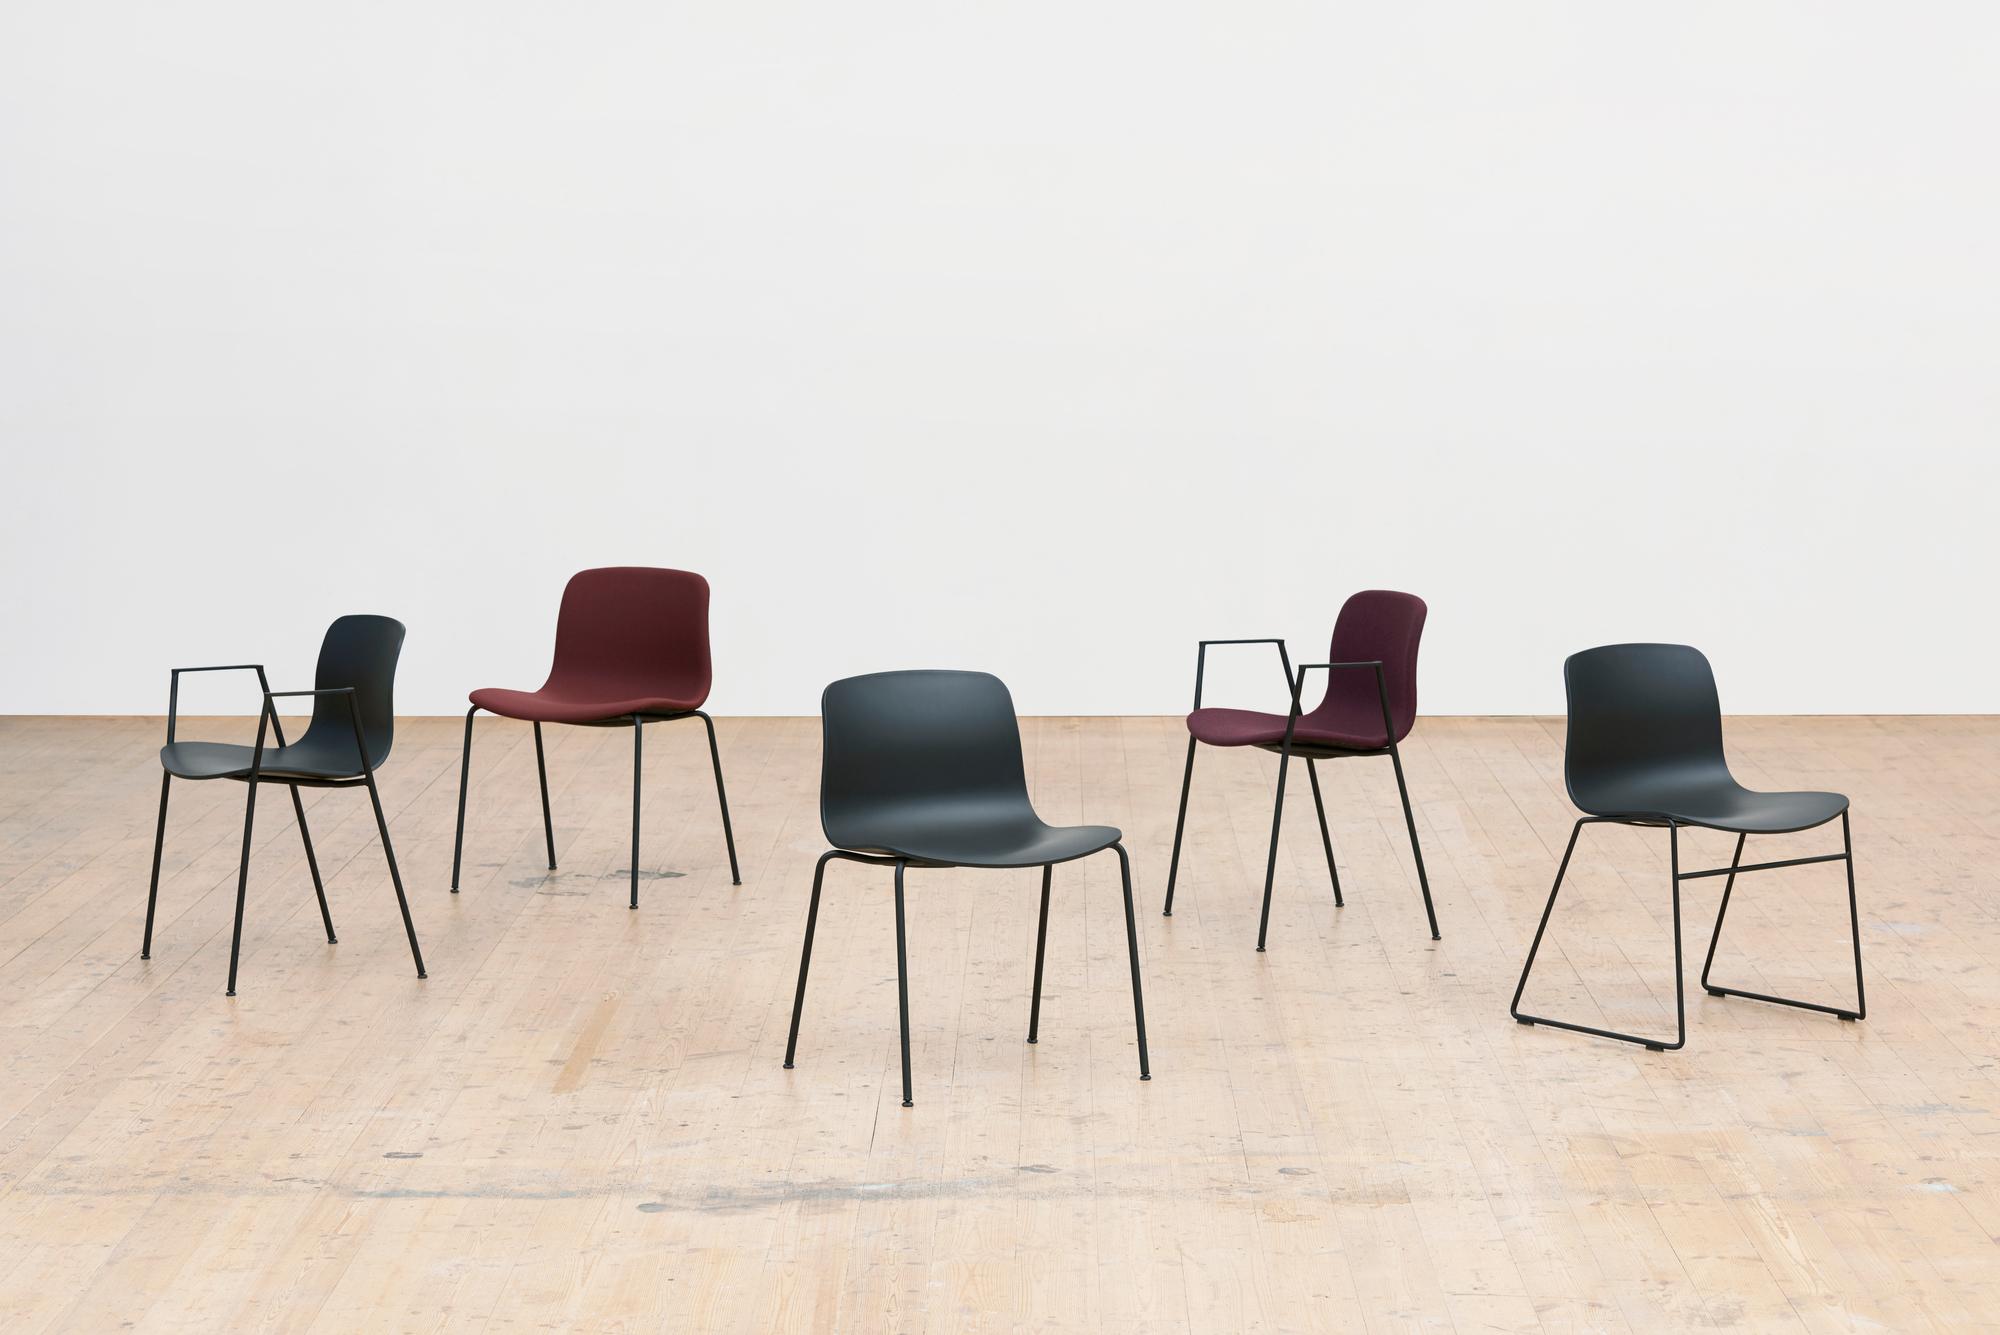 About A Chair AAC08 / AAC08 Stuhl Weiss - Schwarz Hay